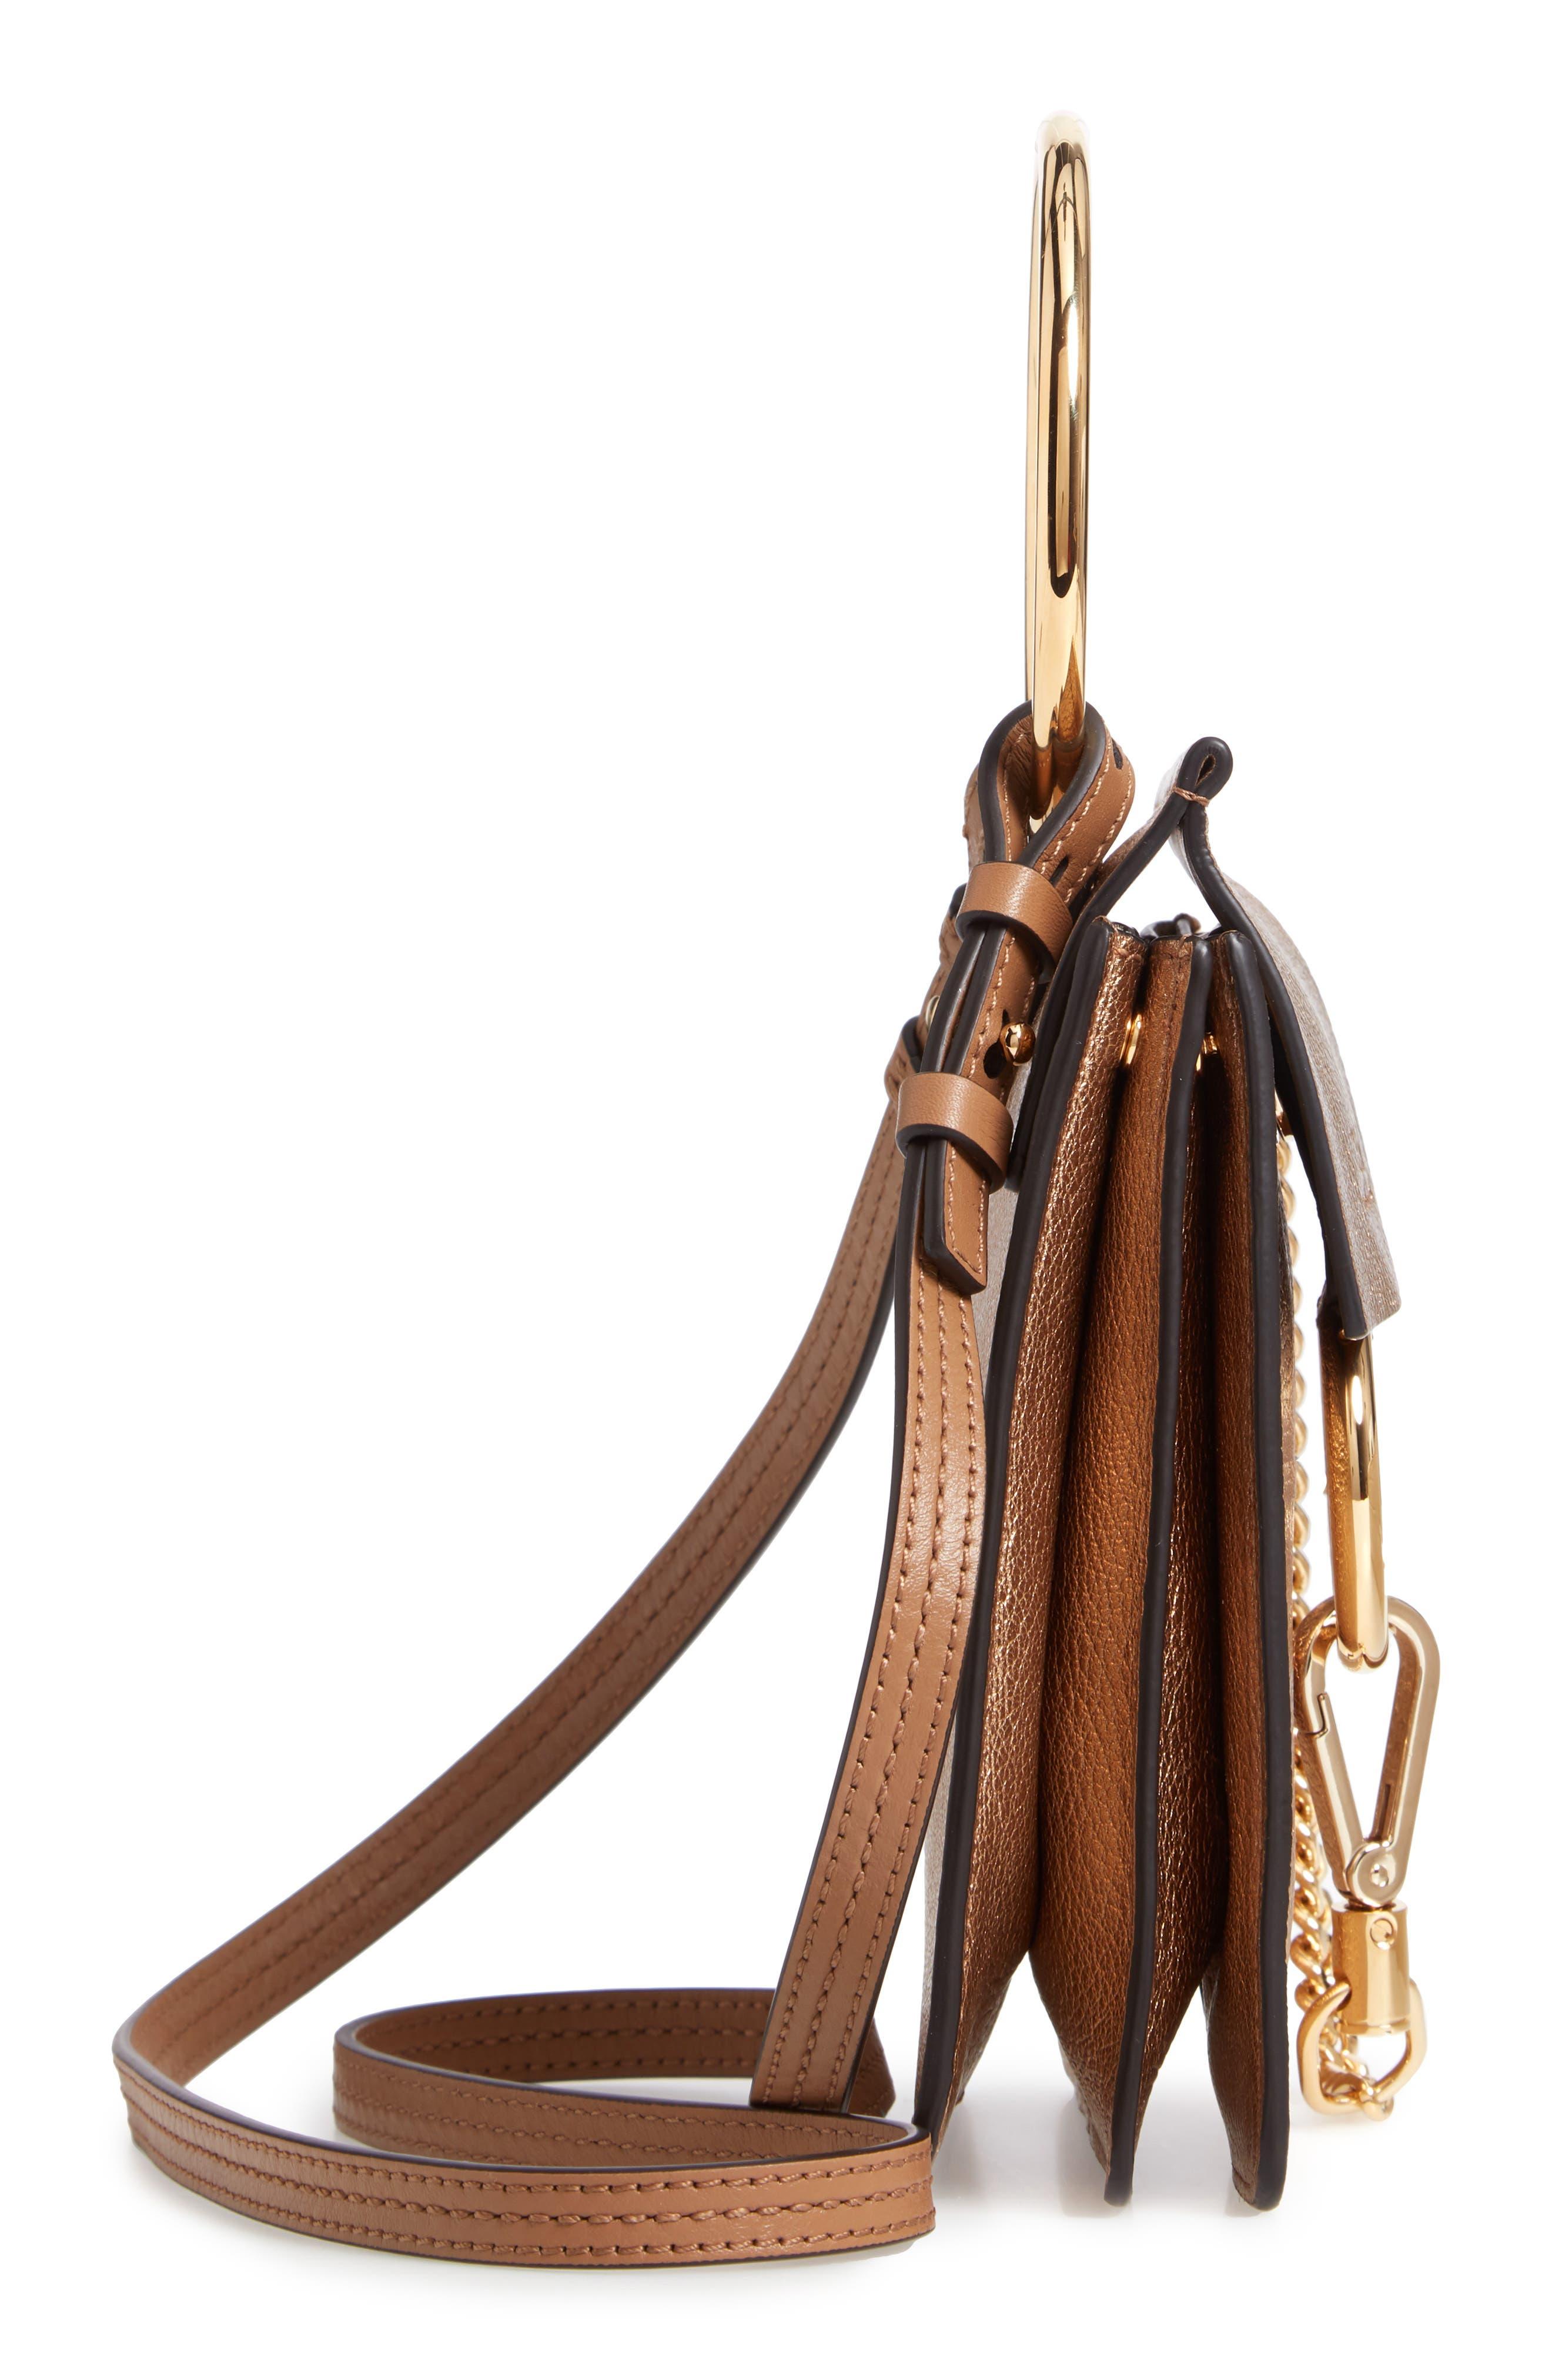 Faye Small Metallic Leather Bracelet Bag,                             Alternate thumbnail 6, color,                             GOLD